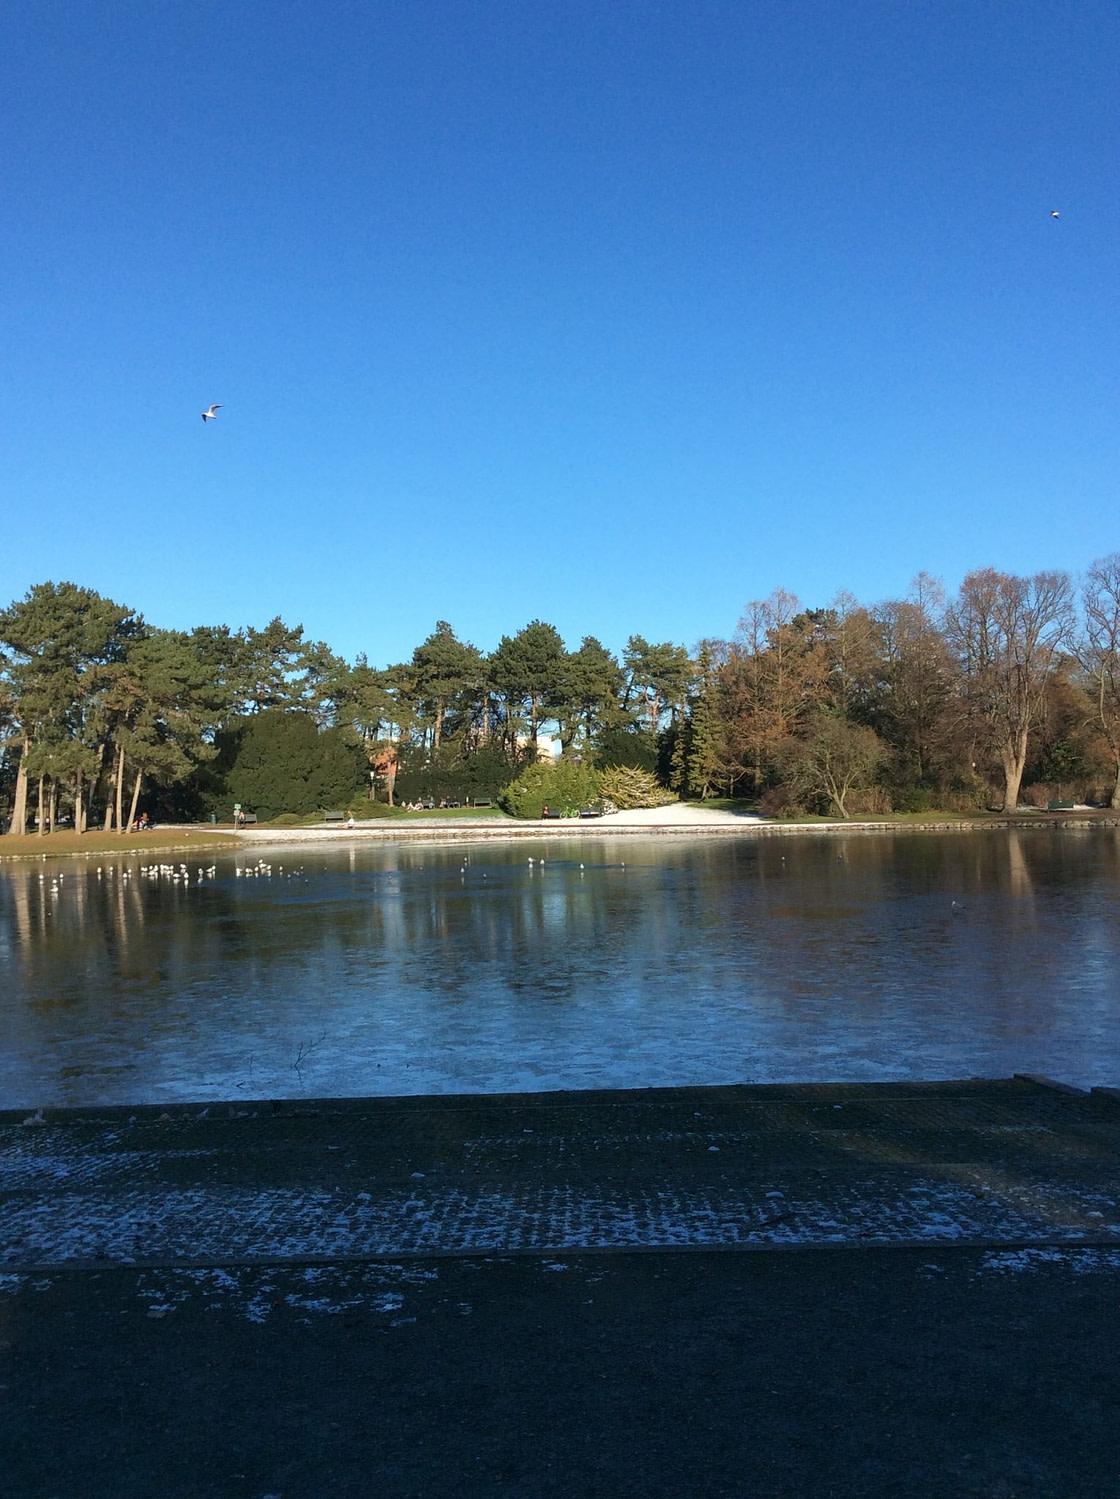 Theparks in Malmö